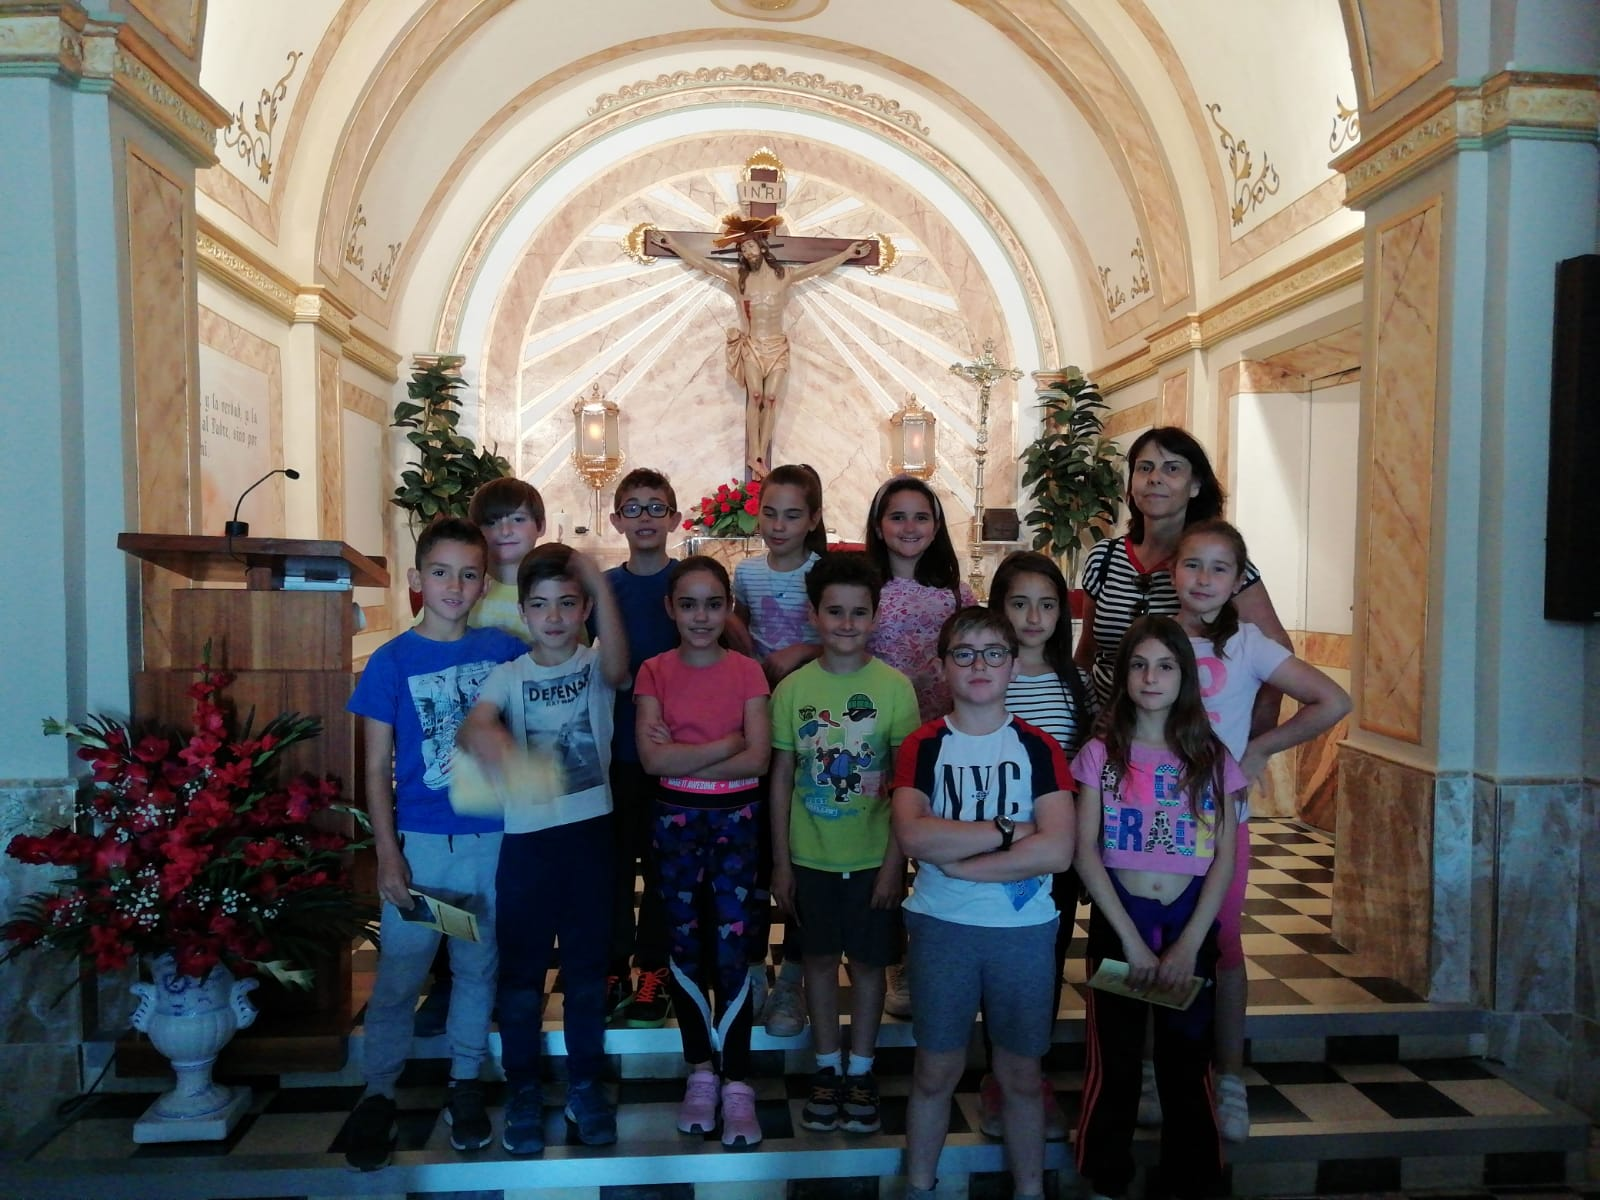 (2019-05-23) Visita ermita alumnos Laura - 3 C primaria - Reina Sofia - María Isabel Berenguer (03)